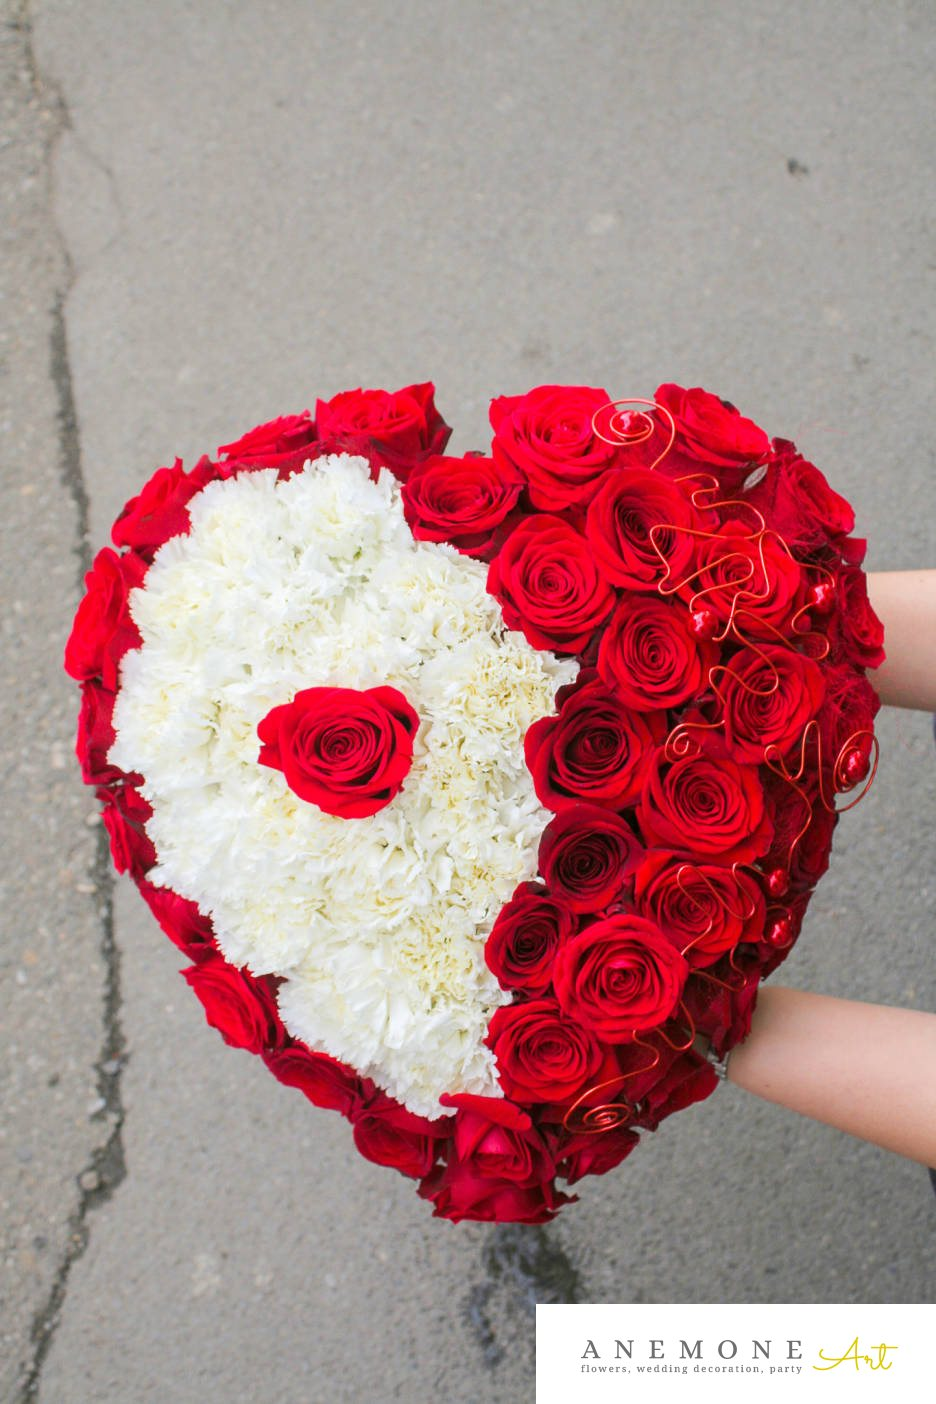 Poza, foto cu Flori de nunta alb, decor tematic, garoafe, perle, rosu, trandafiri in Arad, Timisoara, Oradea (wedding flowers, bouquets) nunta Arad, Timisoara, Oradea